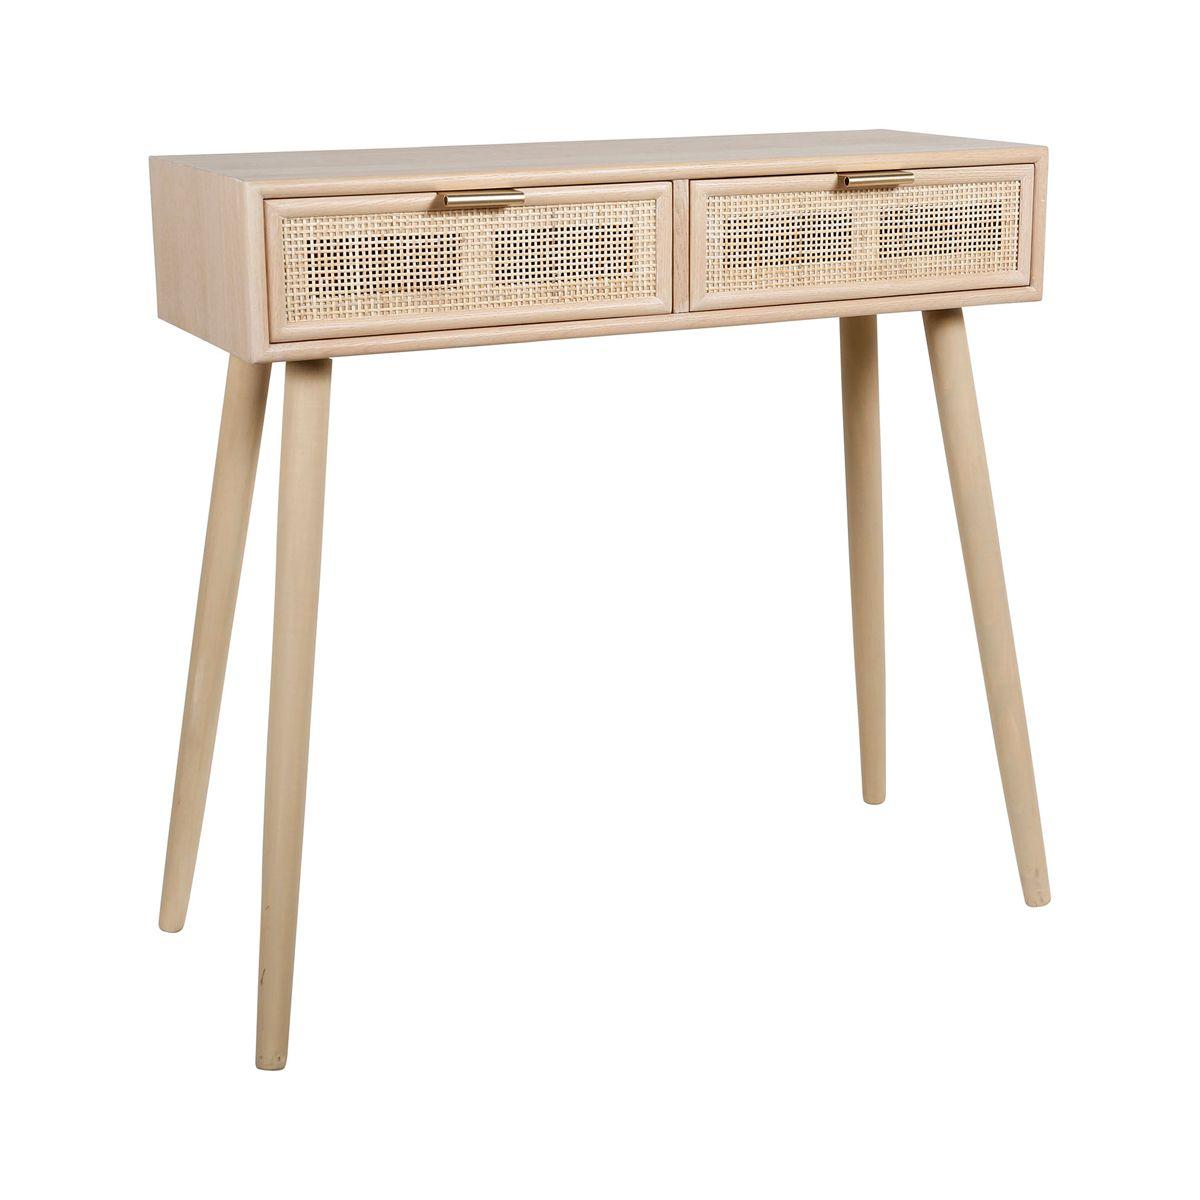 Console bois avec 2 tiroirs tressés en rotin